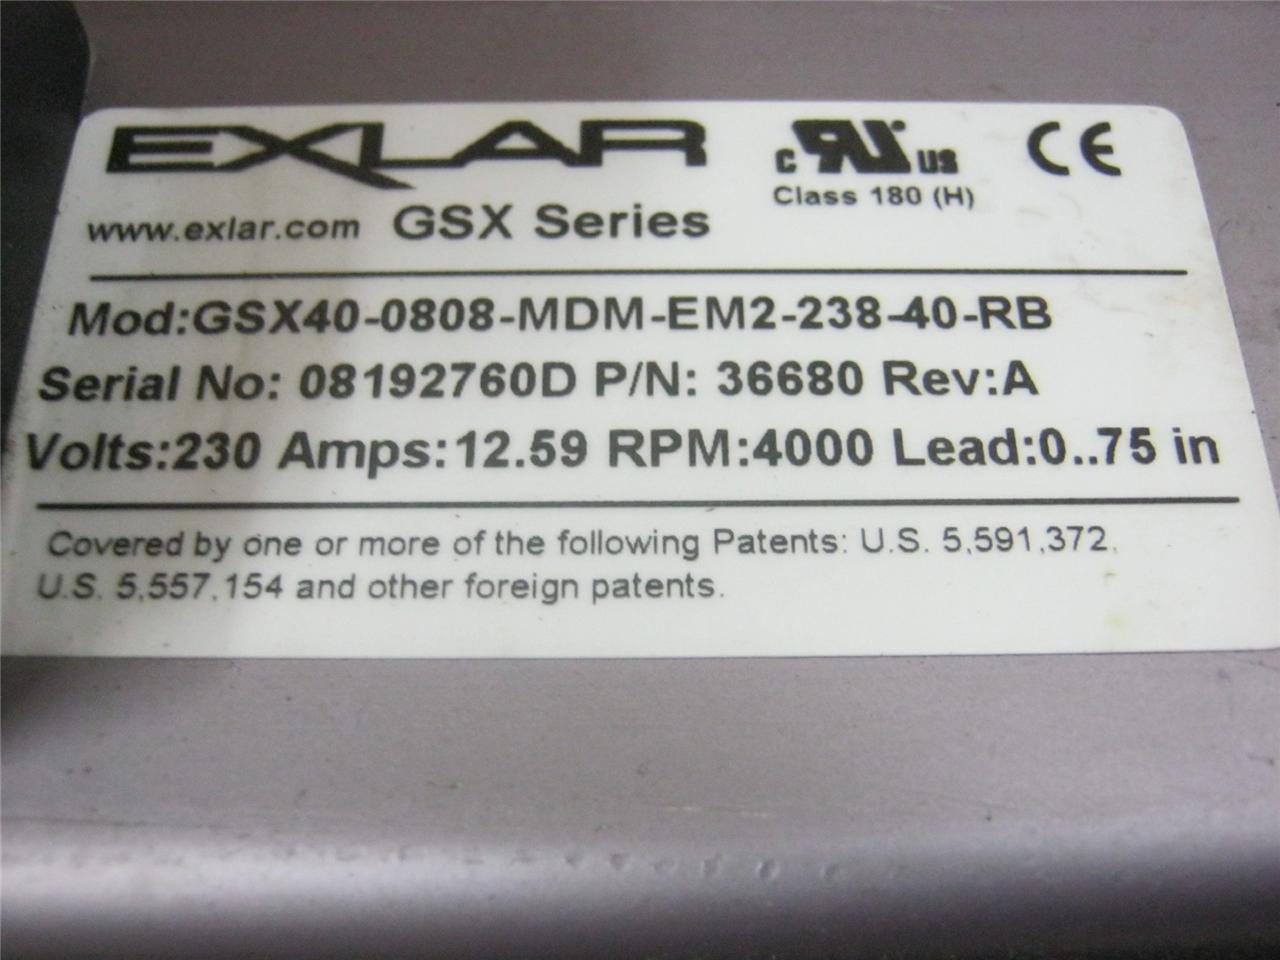 Exlar GSX Series Linear Actuator GSX40-0808-MDM-EM2-238-40-RB Servo Motor